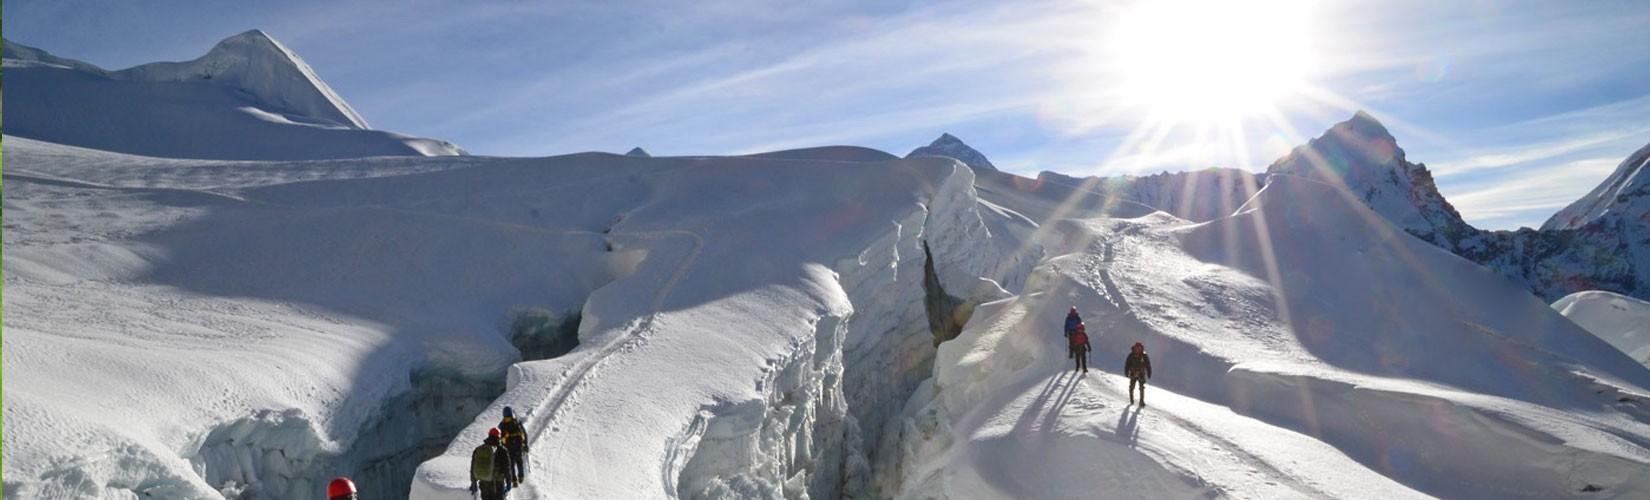 Peak Climb in Nepal